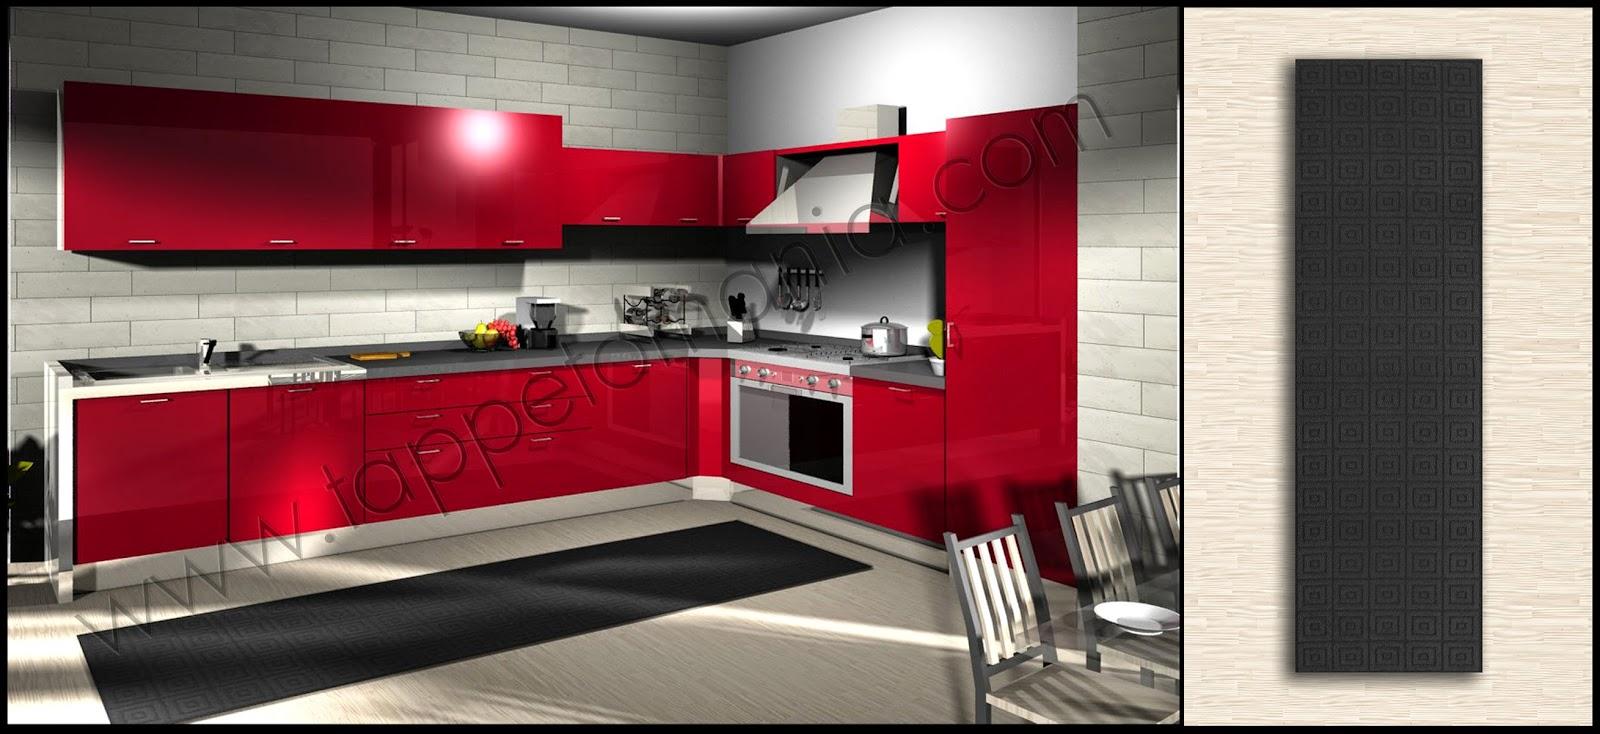 Piastrelle Rosse Per Cucina. Top Awesome Piastrelle Decorate ...